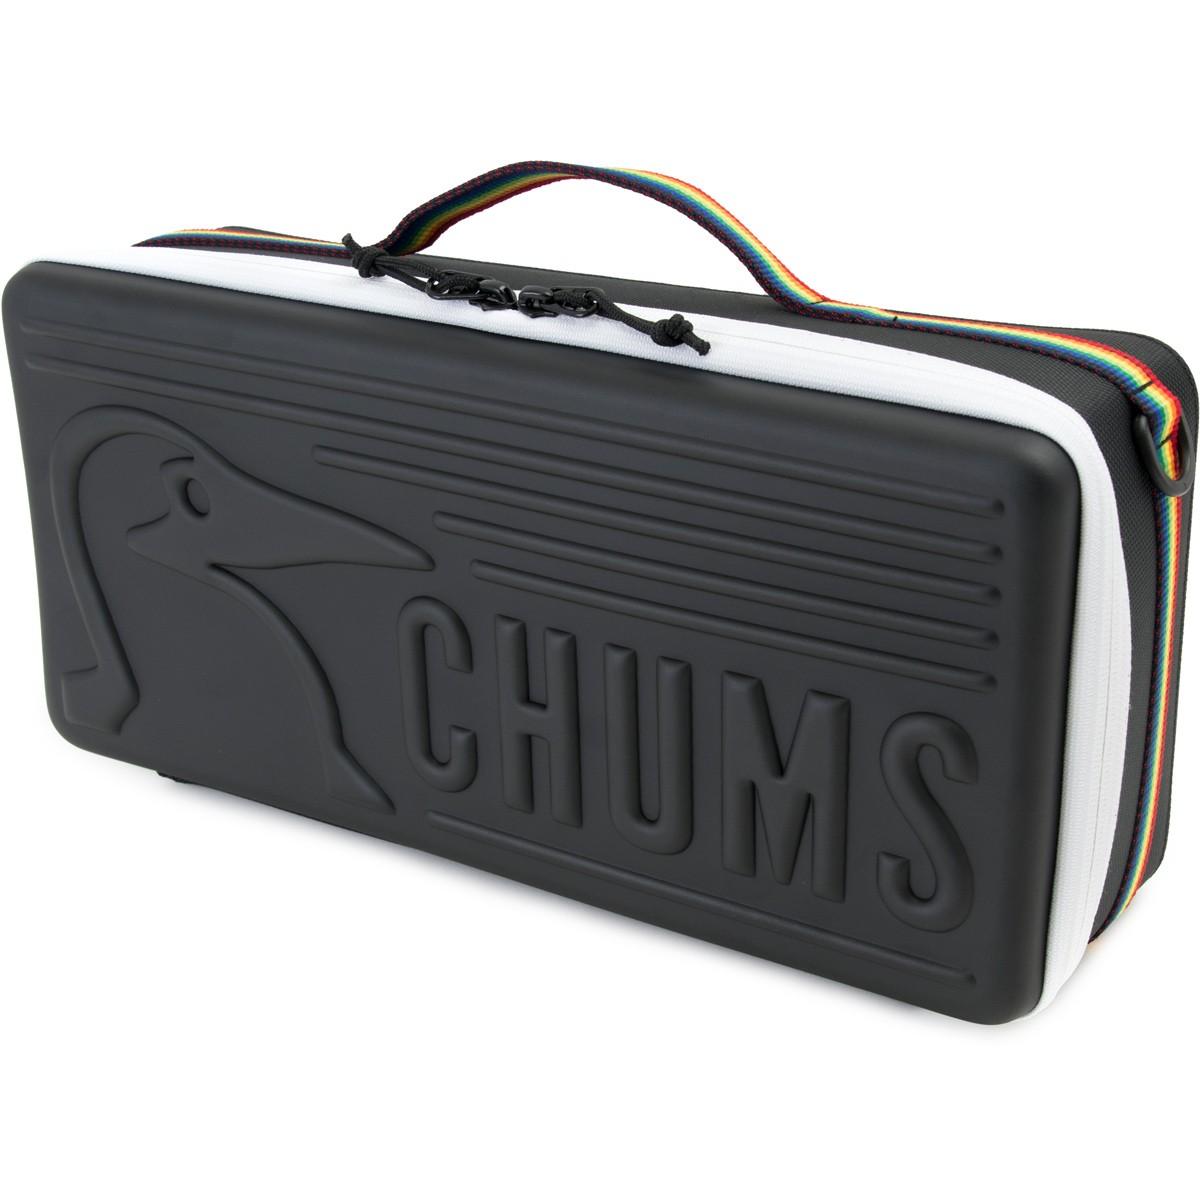 CH62-1195 CHUMS Booby Multi Hard Case Slim チャムス ブービーマルチハードケース スリム